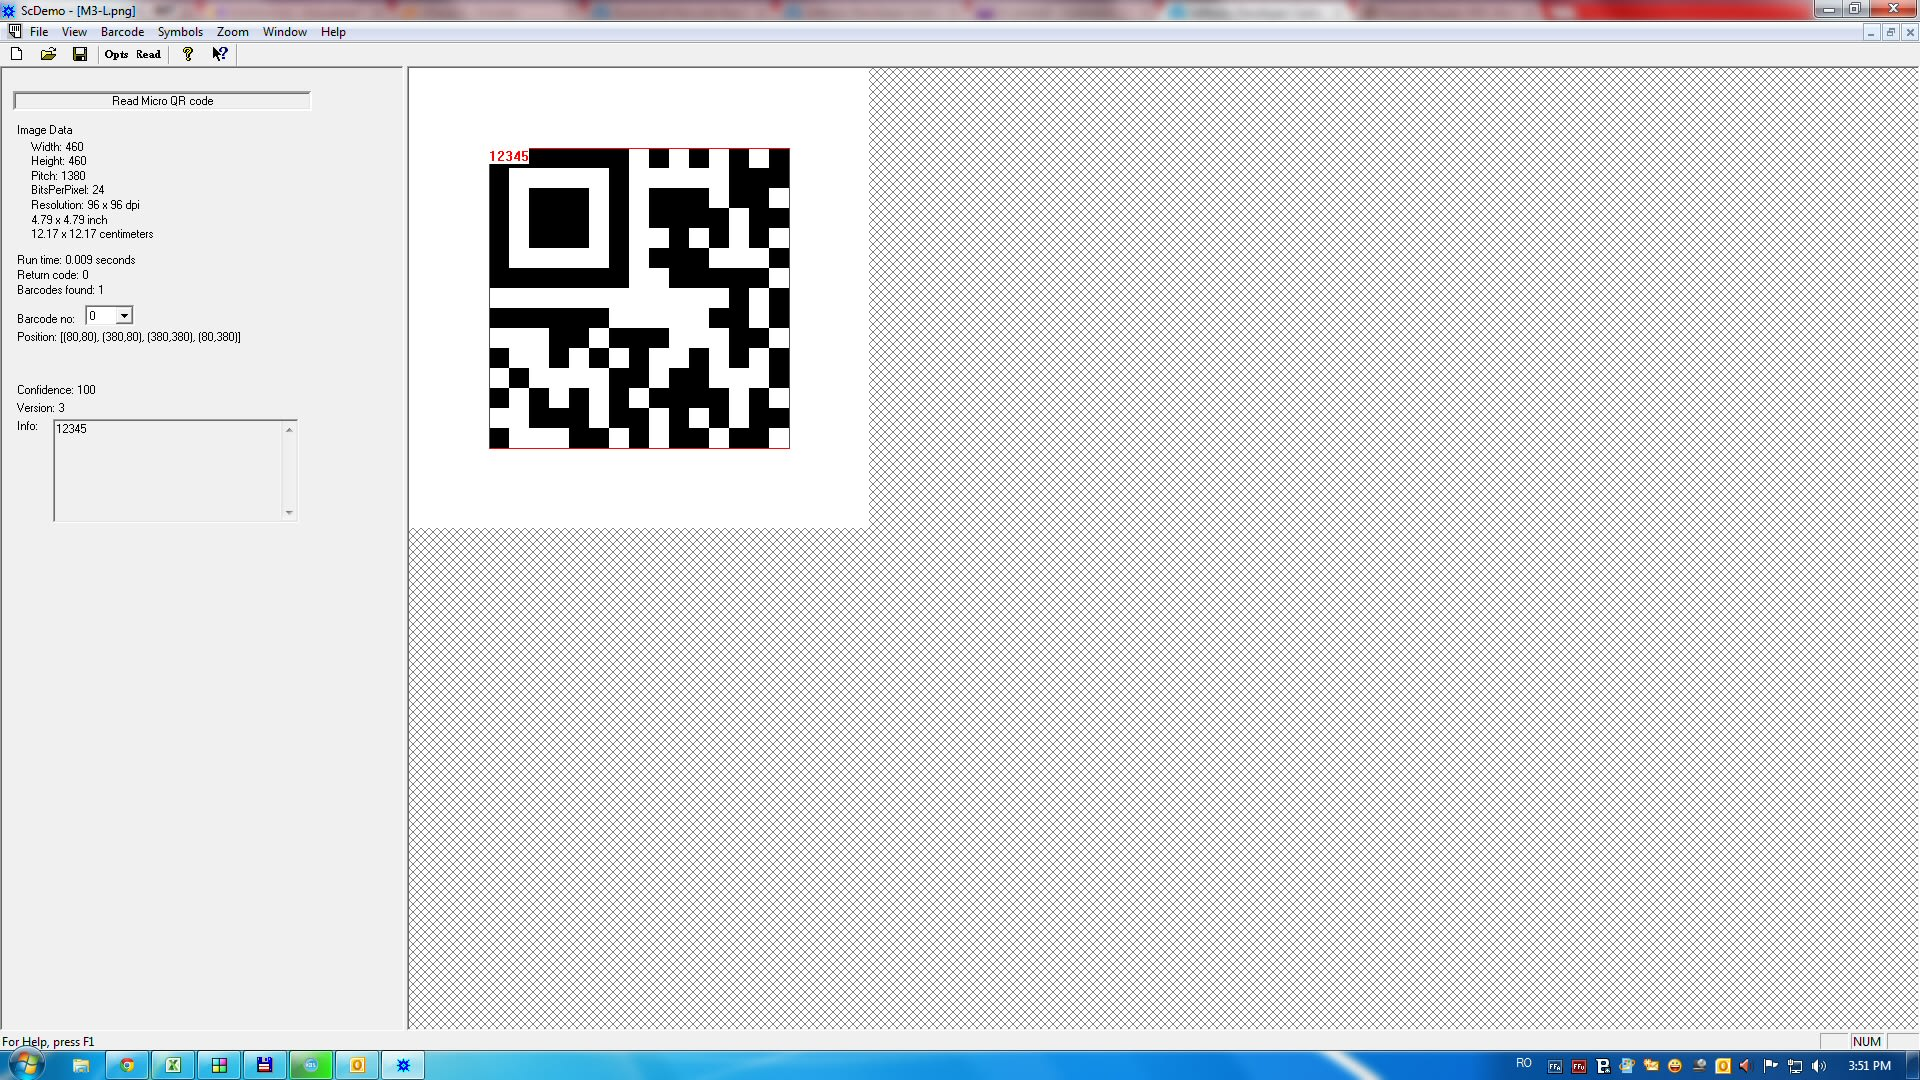 ScWinSDK - barcode reader SDK